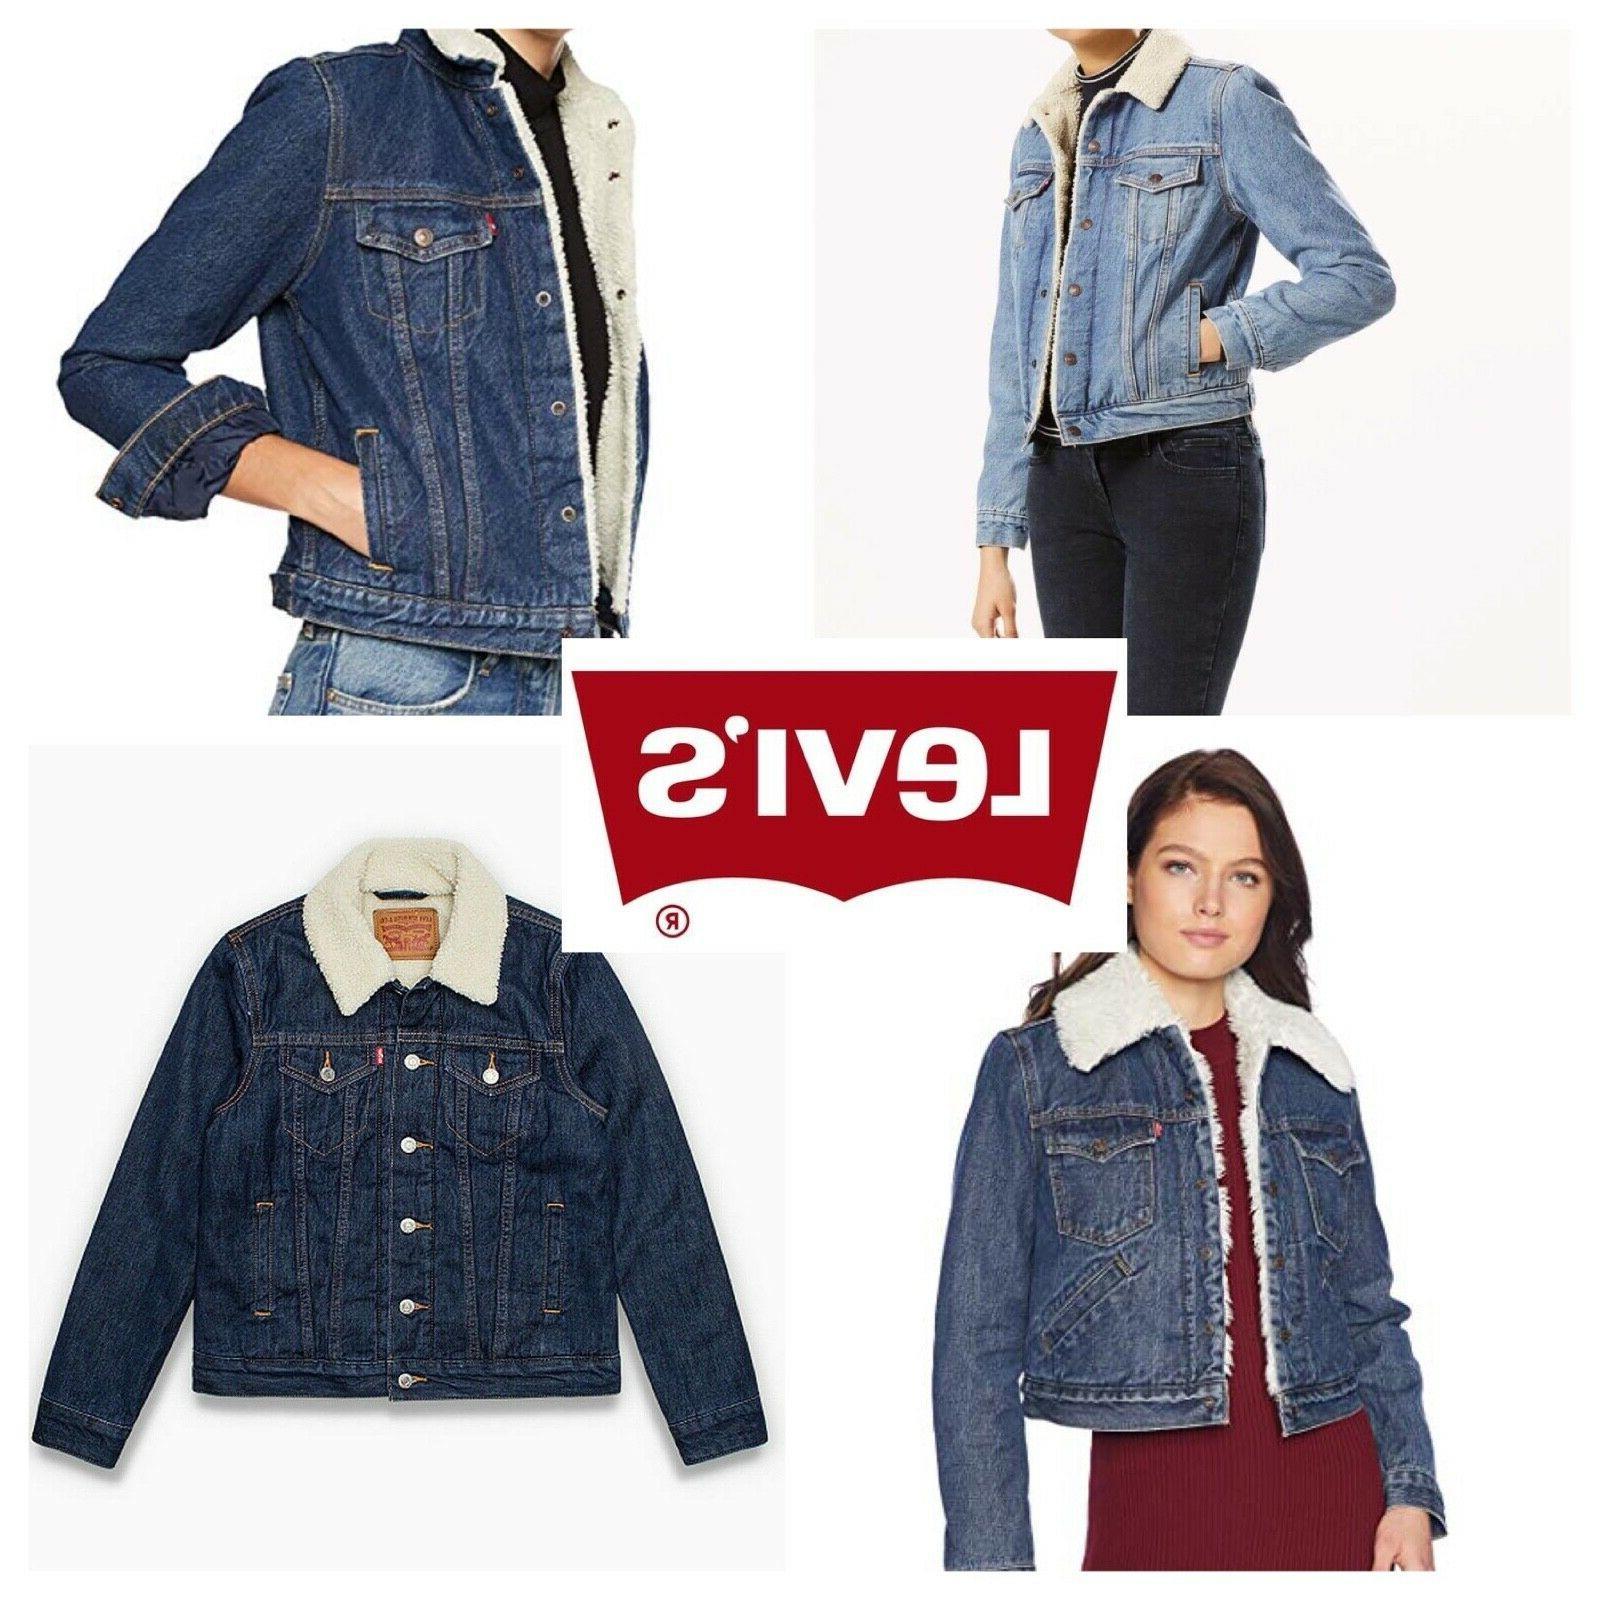 levis sherpa womens trucker jackets many colors